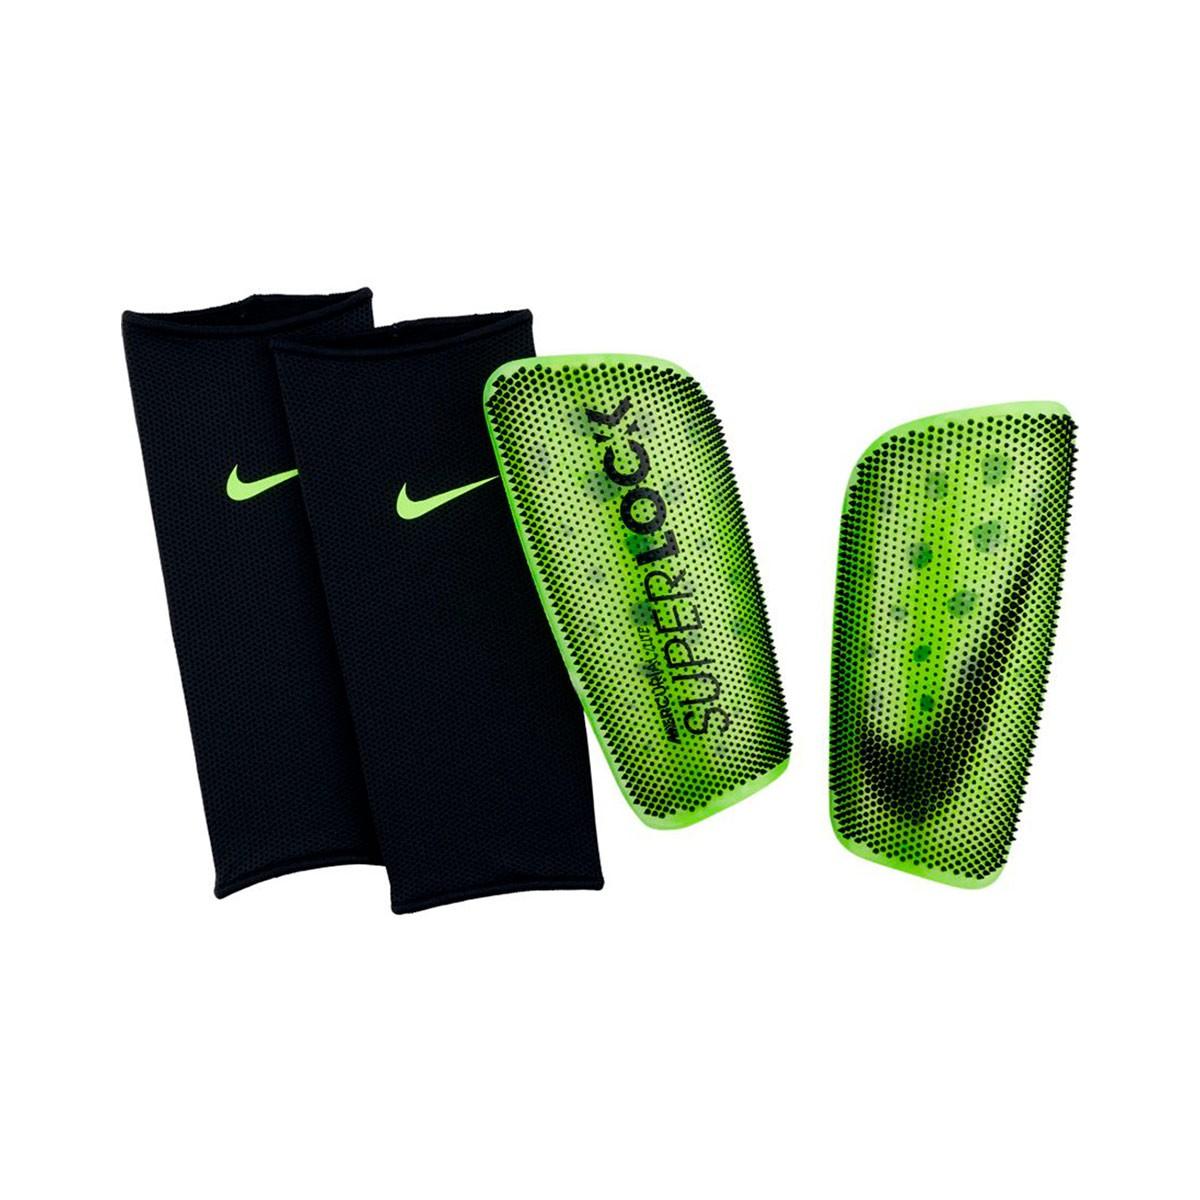 Shinpads Nike Mercurial Lite SuperLock Volt-Black - Football store ... 40a1dc21ff7